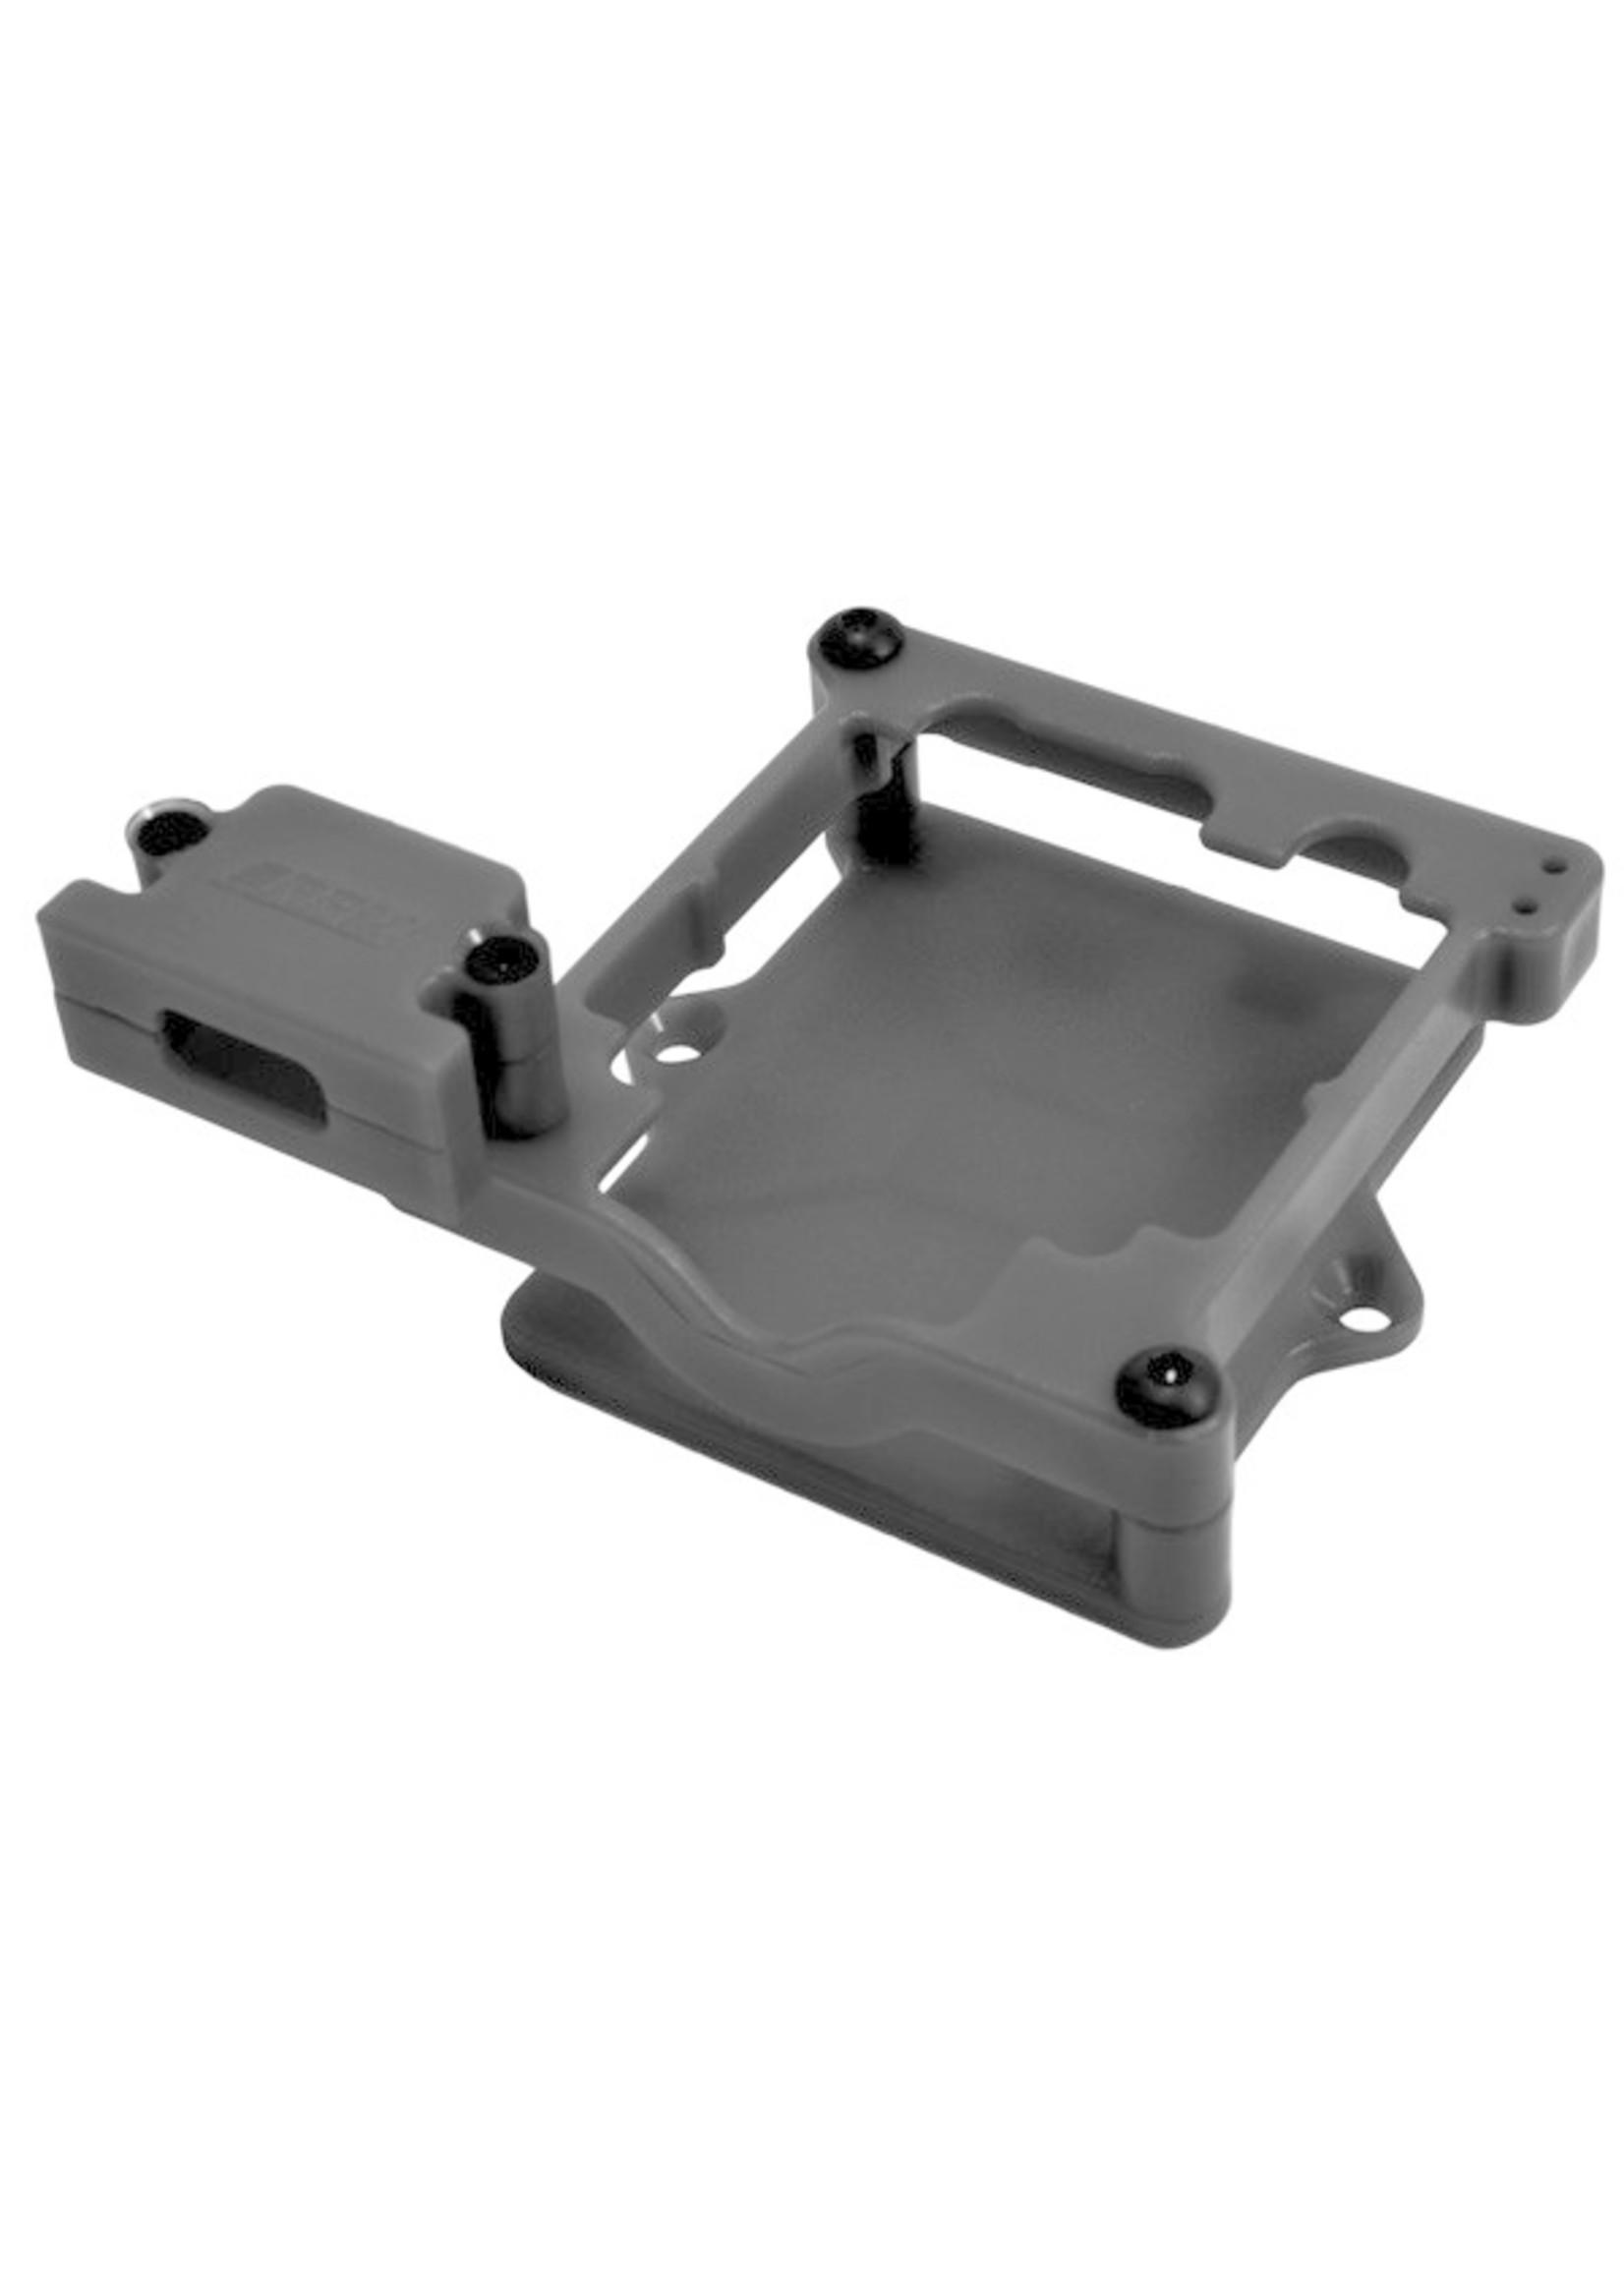 RPM RPM73272 RPM Black ESC Cage for Castle Sidewinder 3 & Sidewinder SCT ESCs